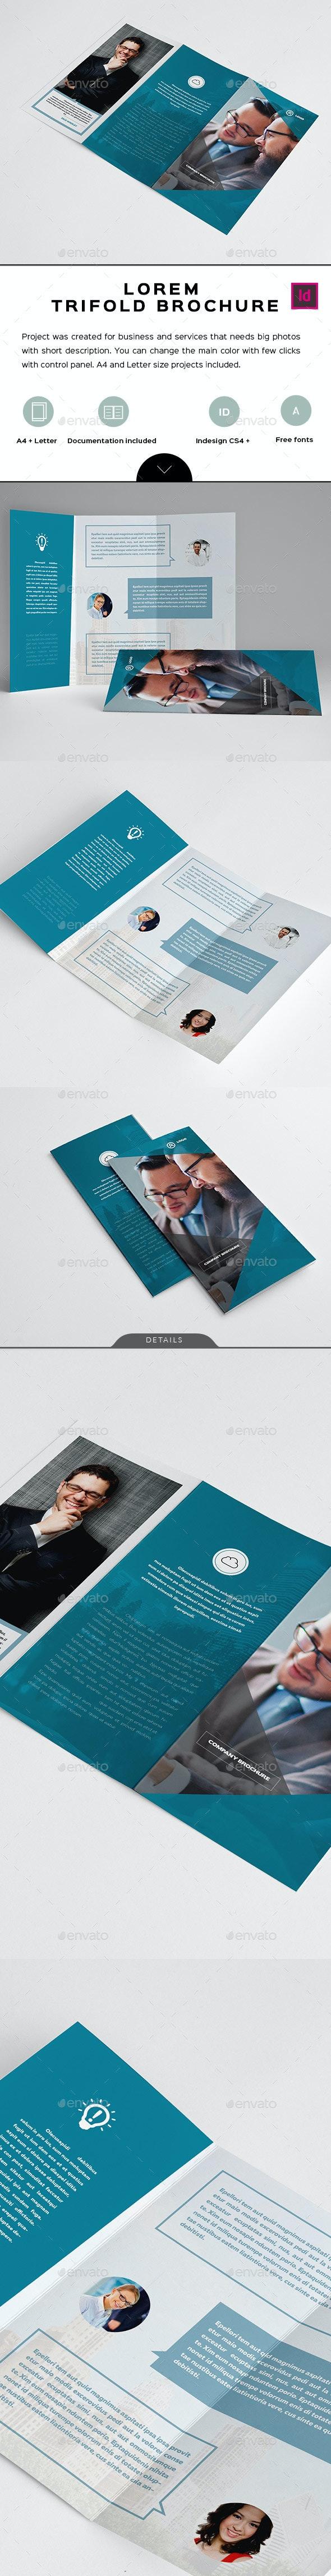 Lorem Trifold Brochure - Corporate Brochures